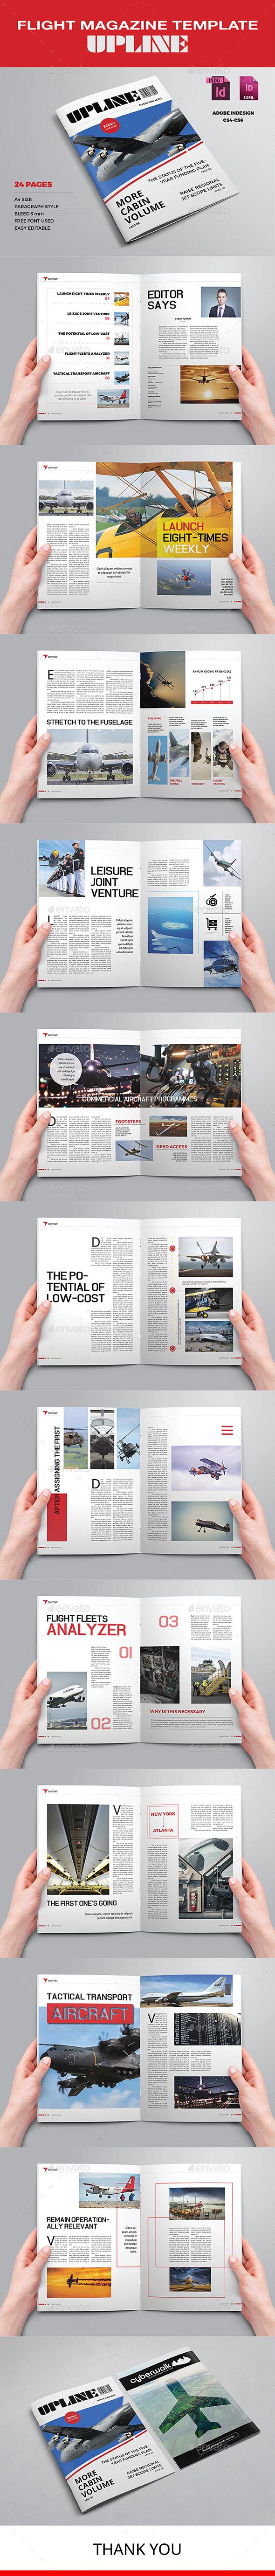 Flight Magazine Template - Upline - Magazines Print Templates